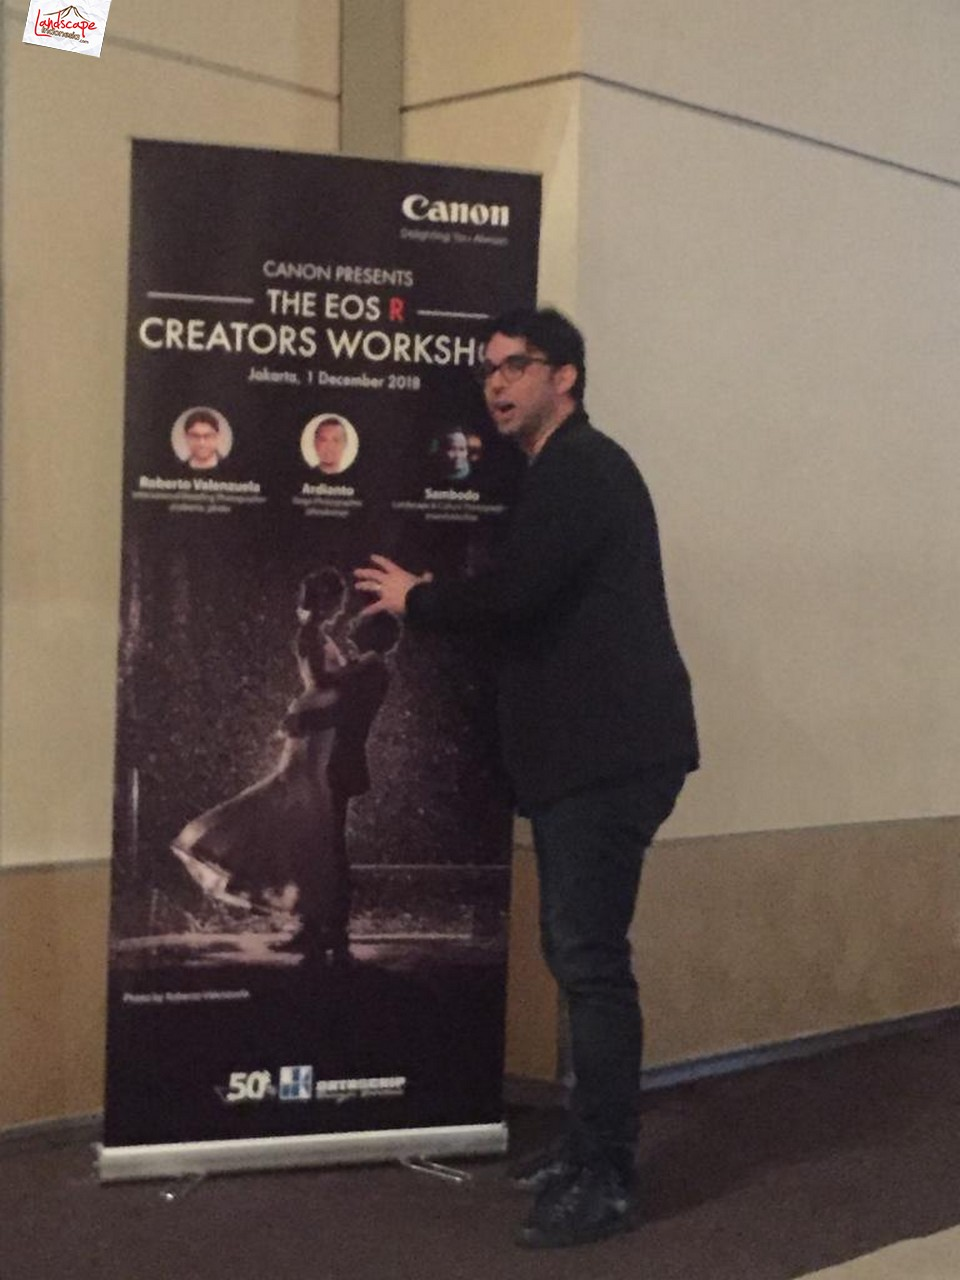 eos r creators workshop 4 - EOS R Creators Workshop